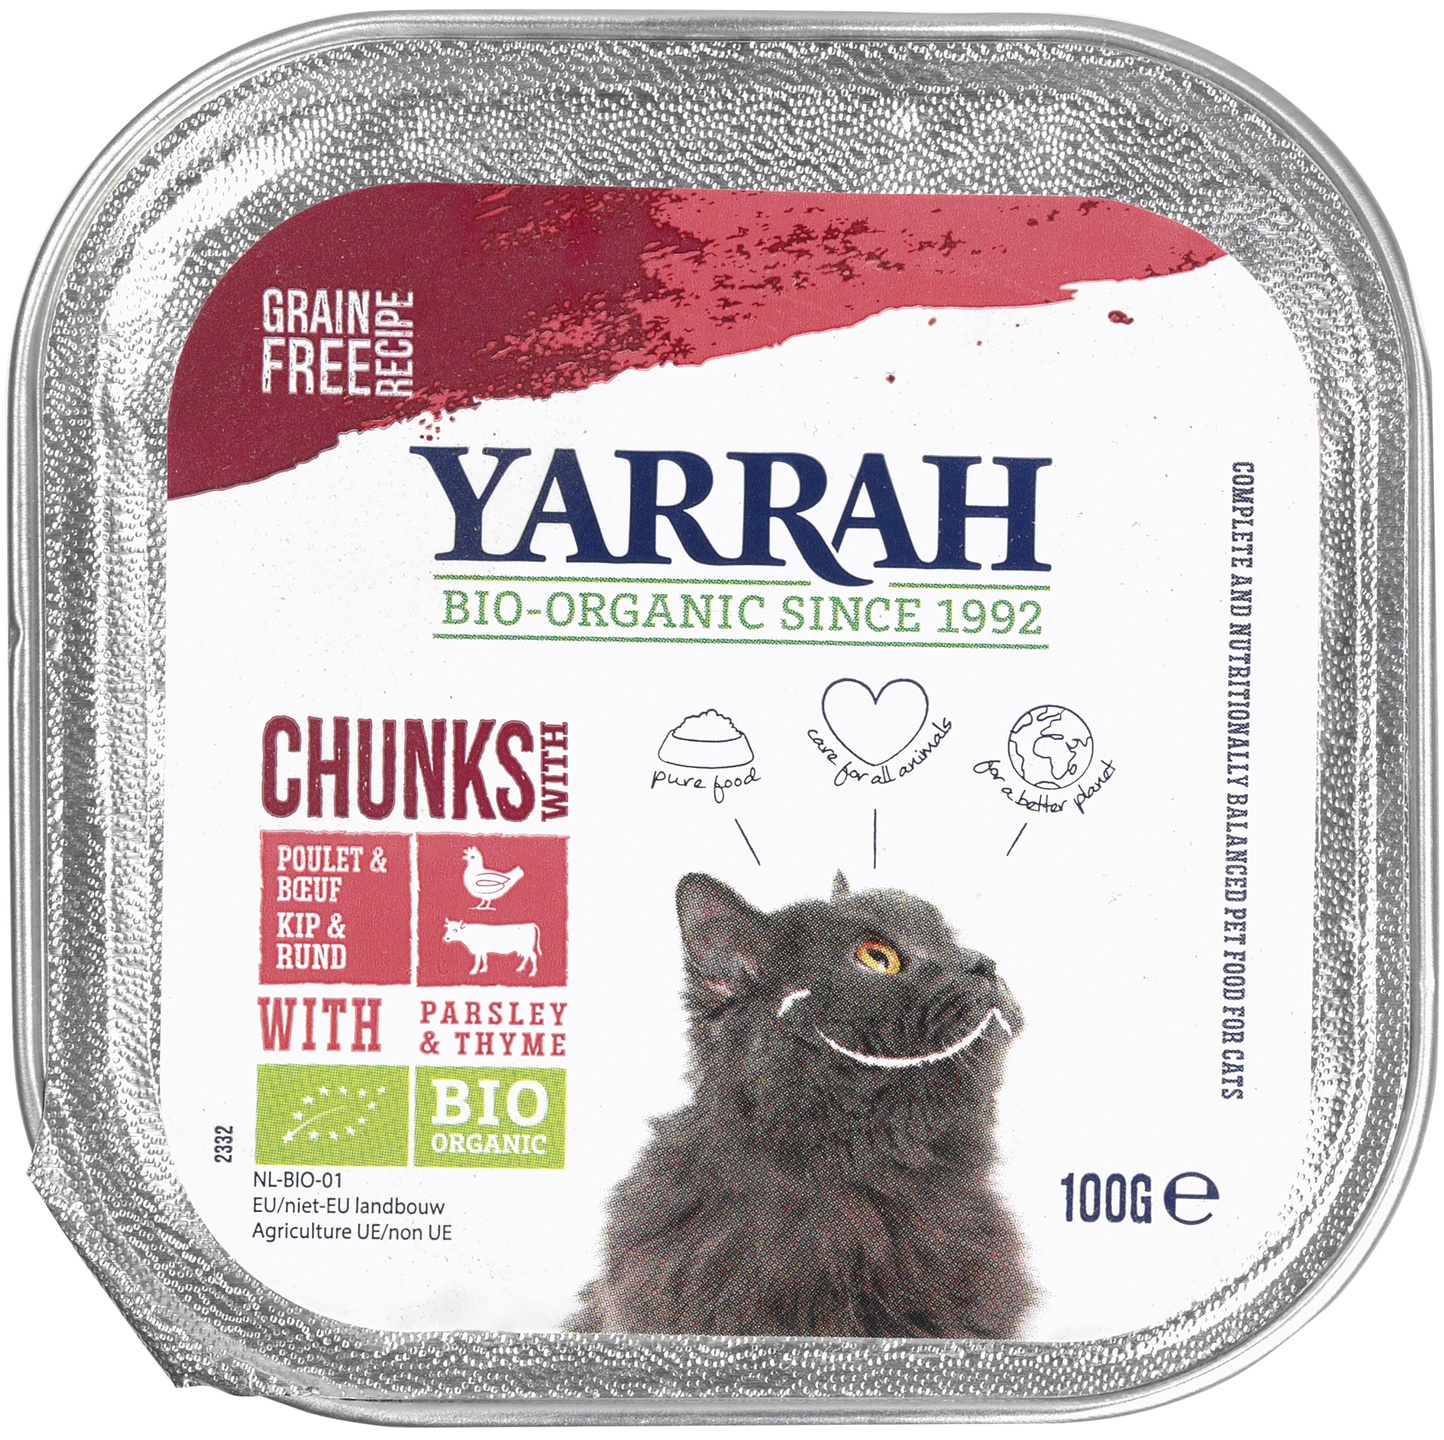 Biologische Yarrah Kattenbrokjes kip rund 100 gr